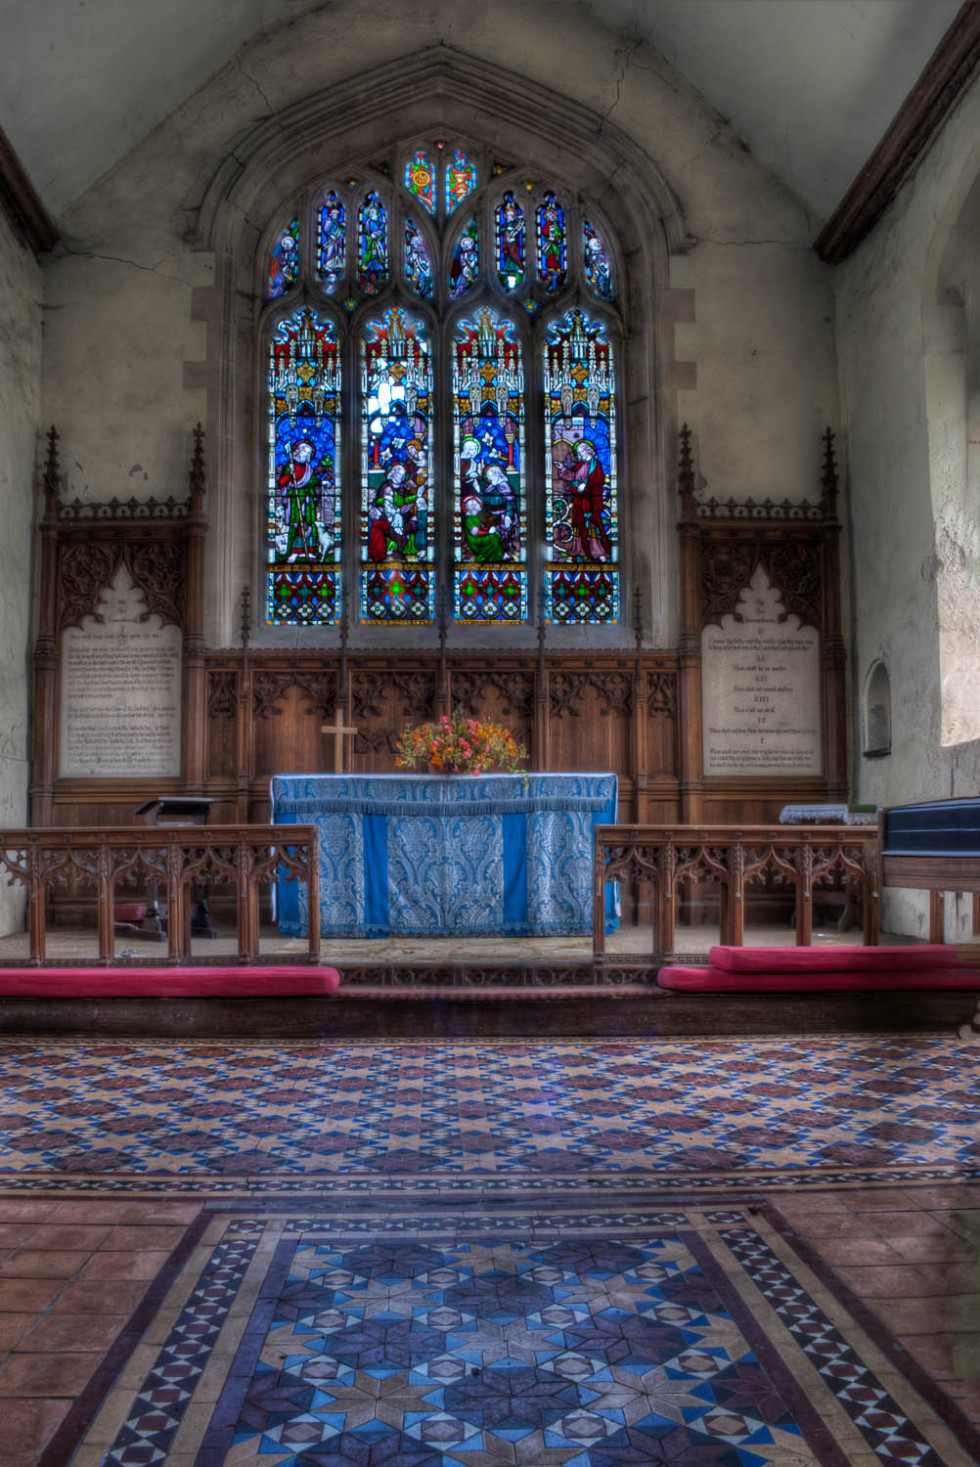 Beauchamp Roding Church The Chancel